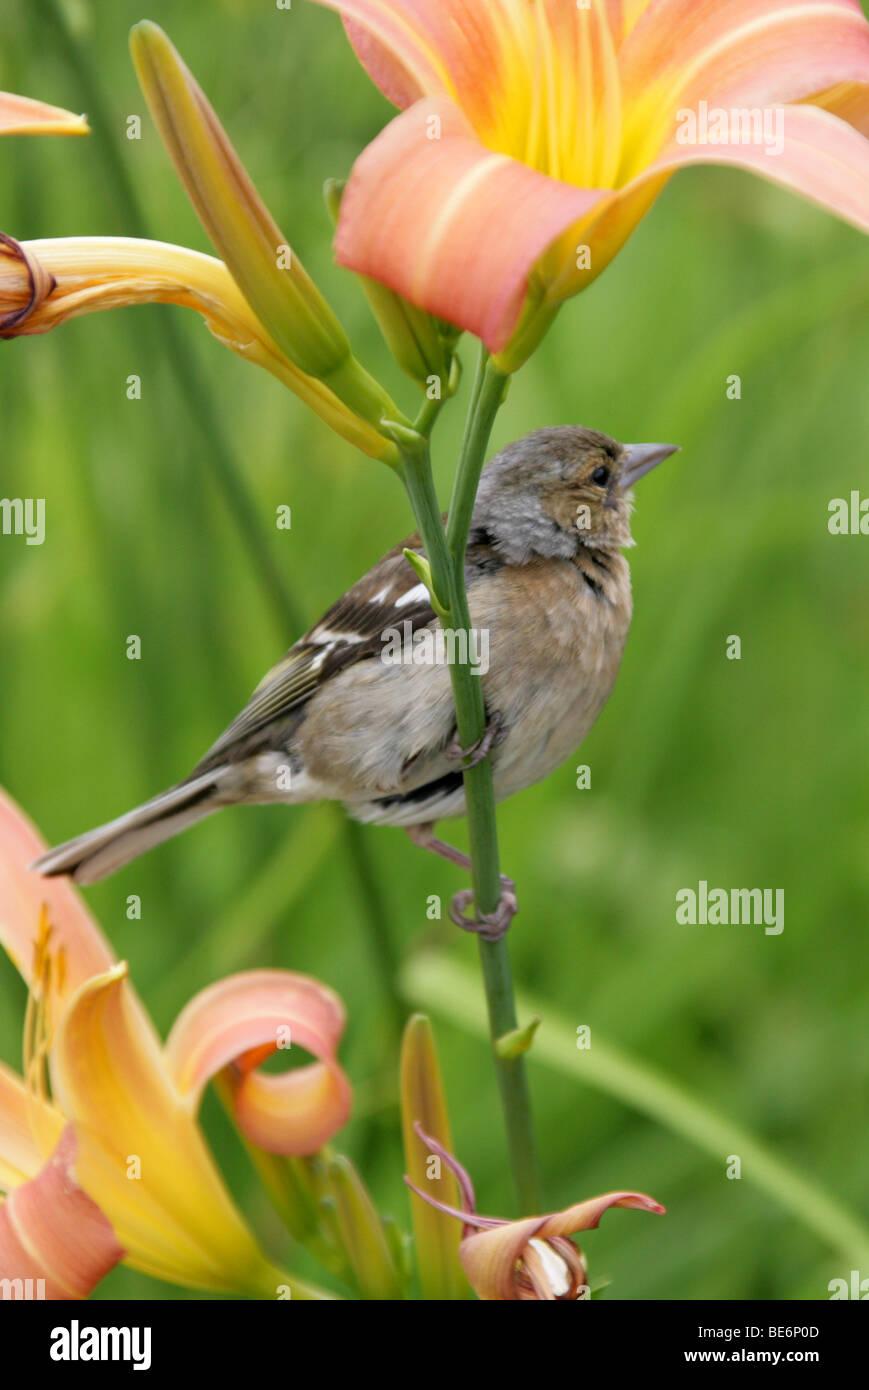 Female Chaffinch, Fringilla coelebs, Fringillidae, Passeriformes aka Spink, Scobby, Shellapple, Wetbird, or Roberd. - Stock Image